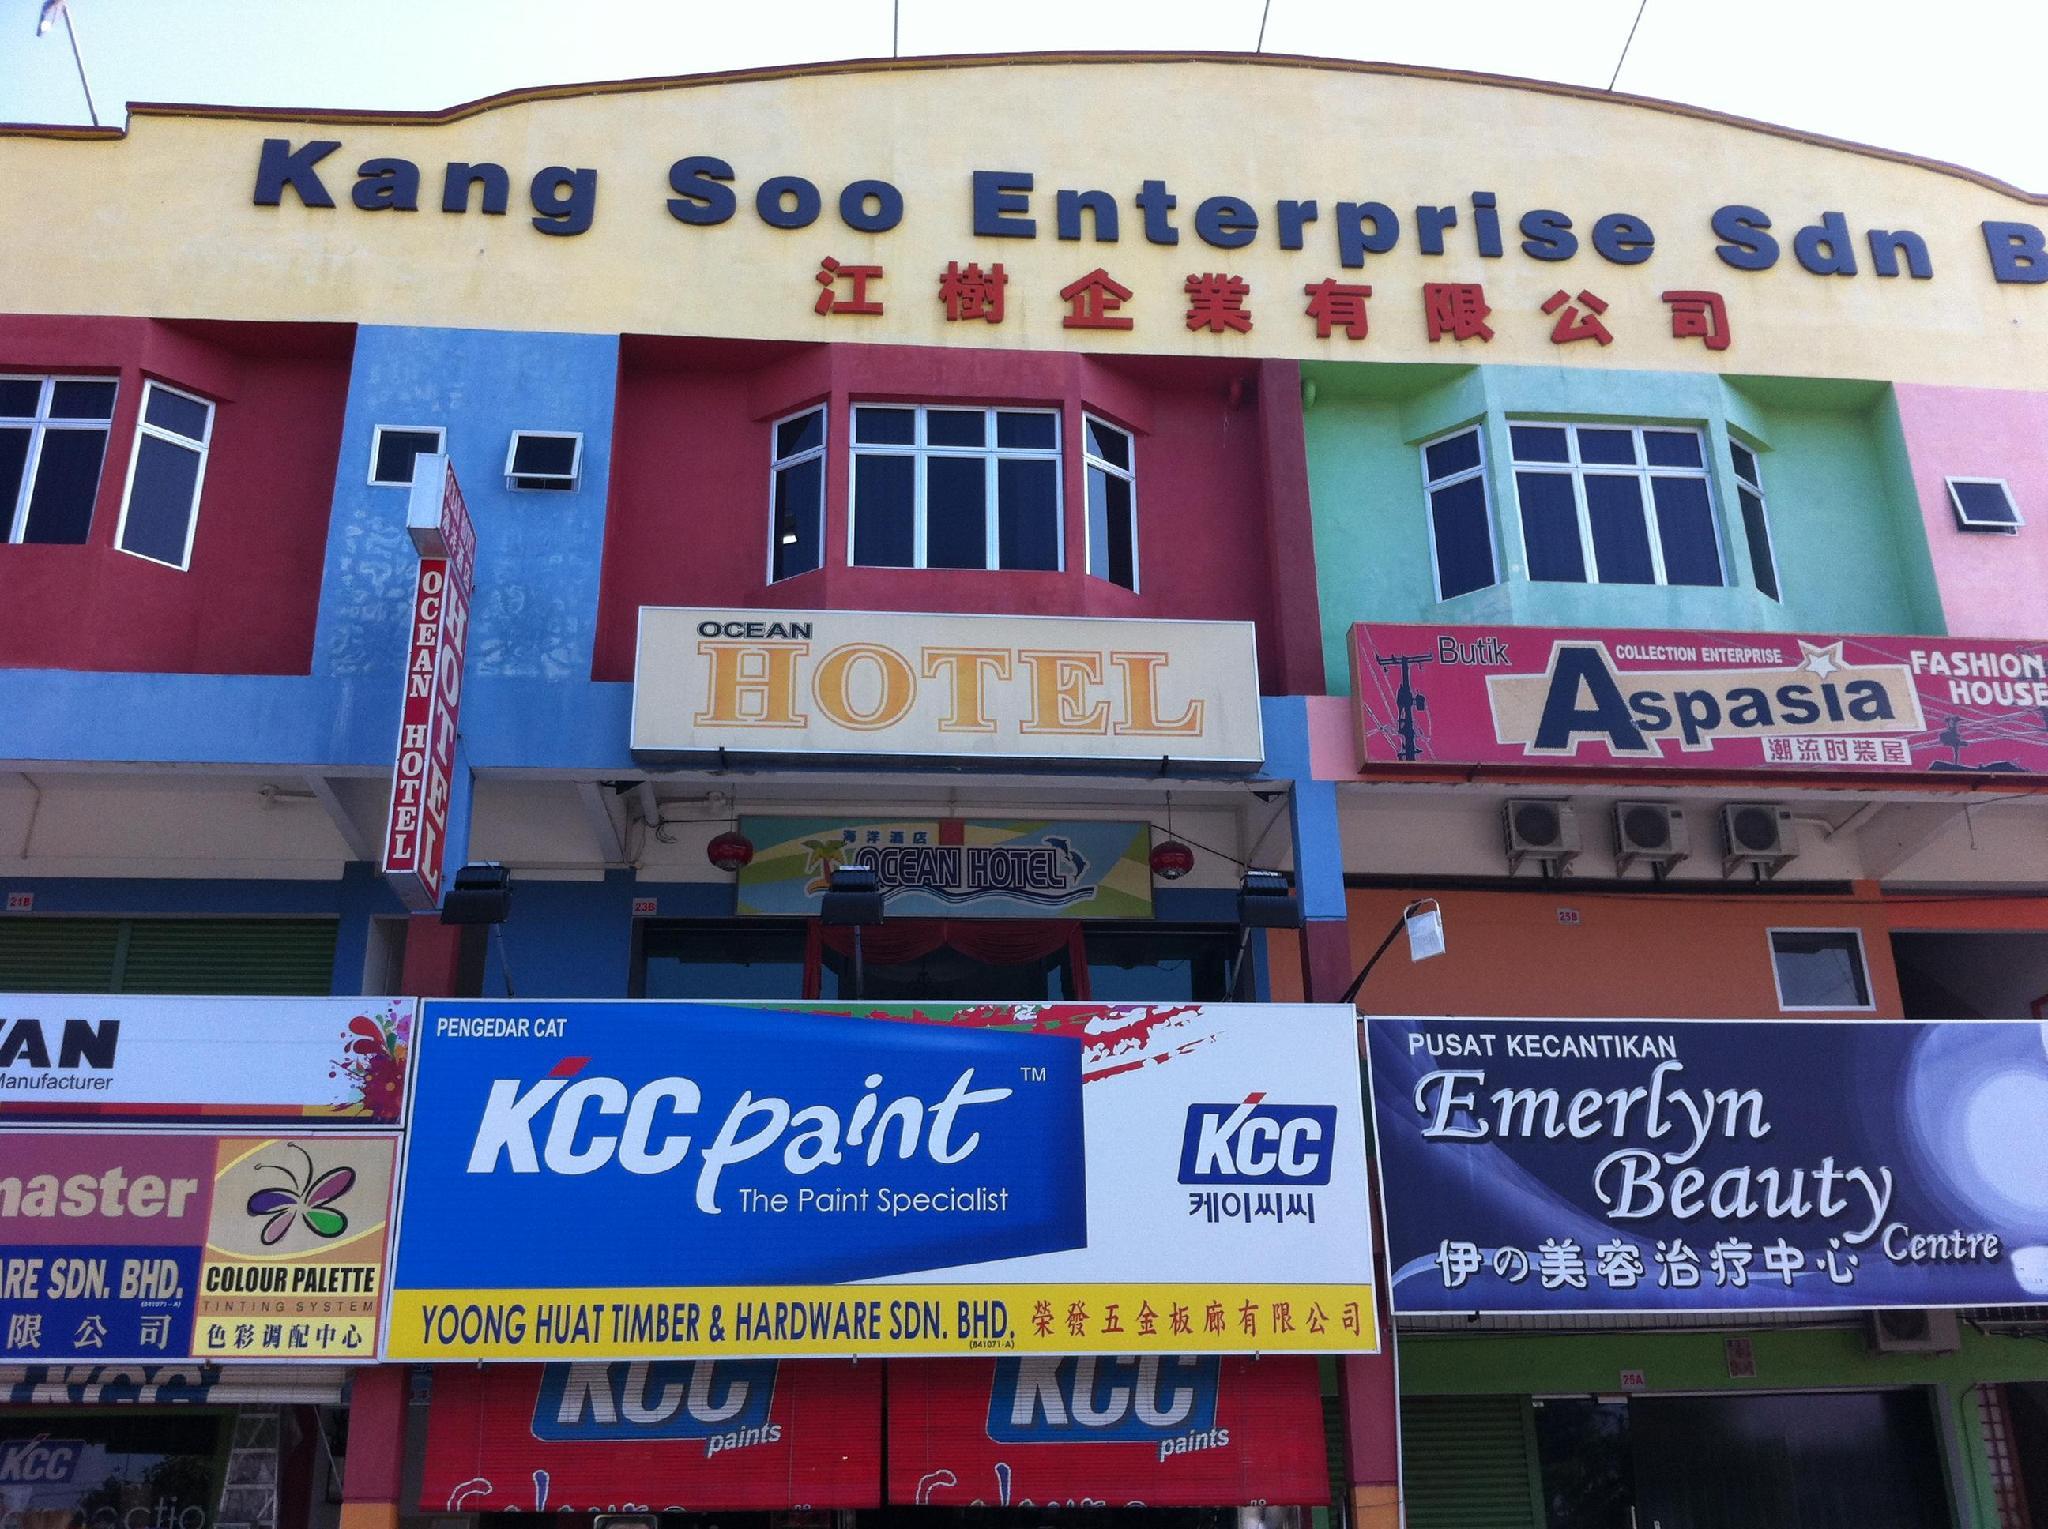 Ocean Hotel, Sabak Bernam